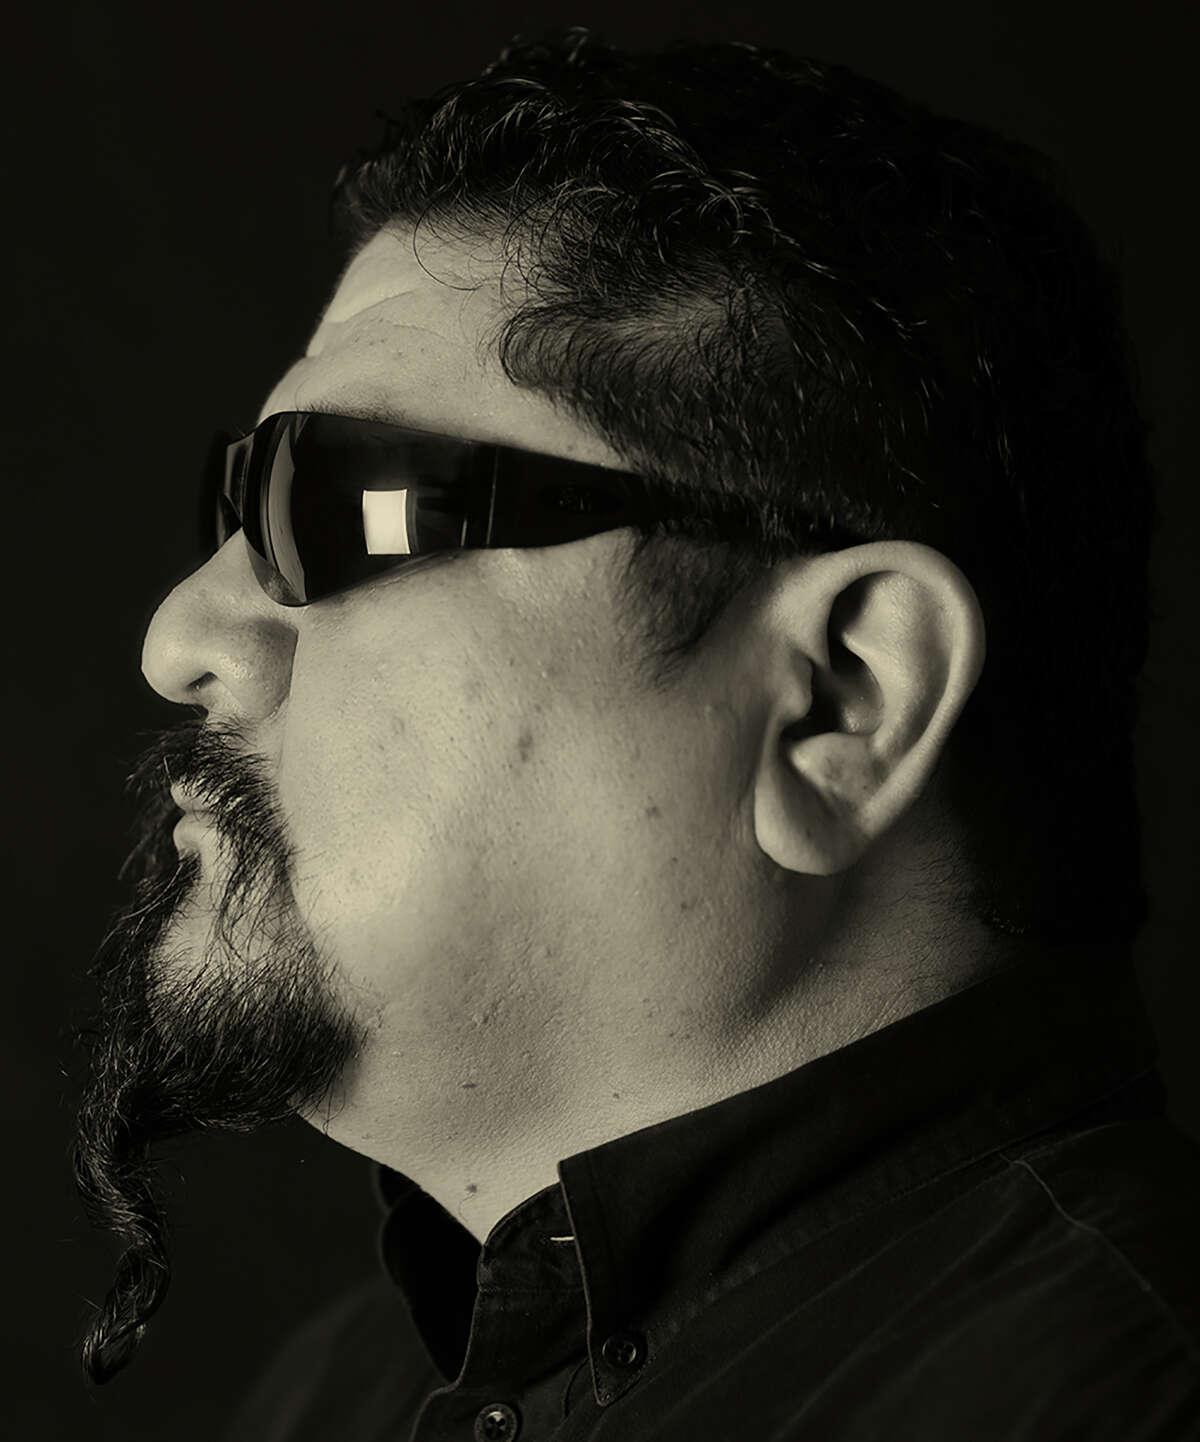 Alex Rubio is one of the artists in Ramin Samandari's